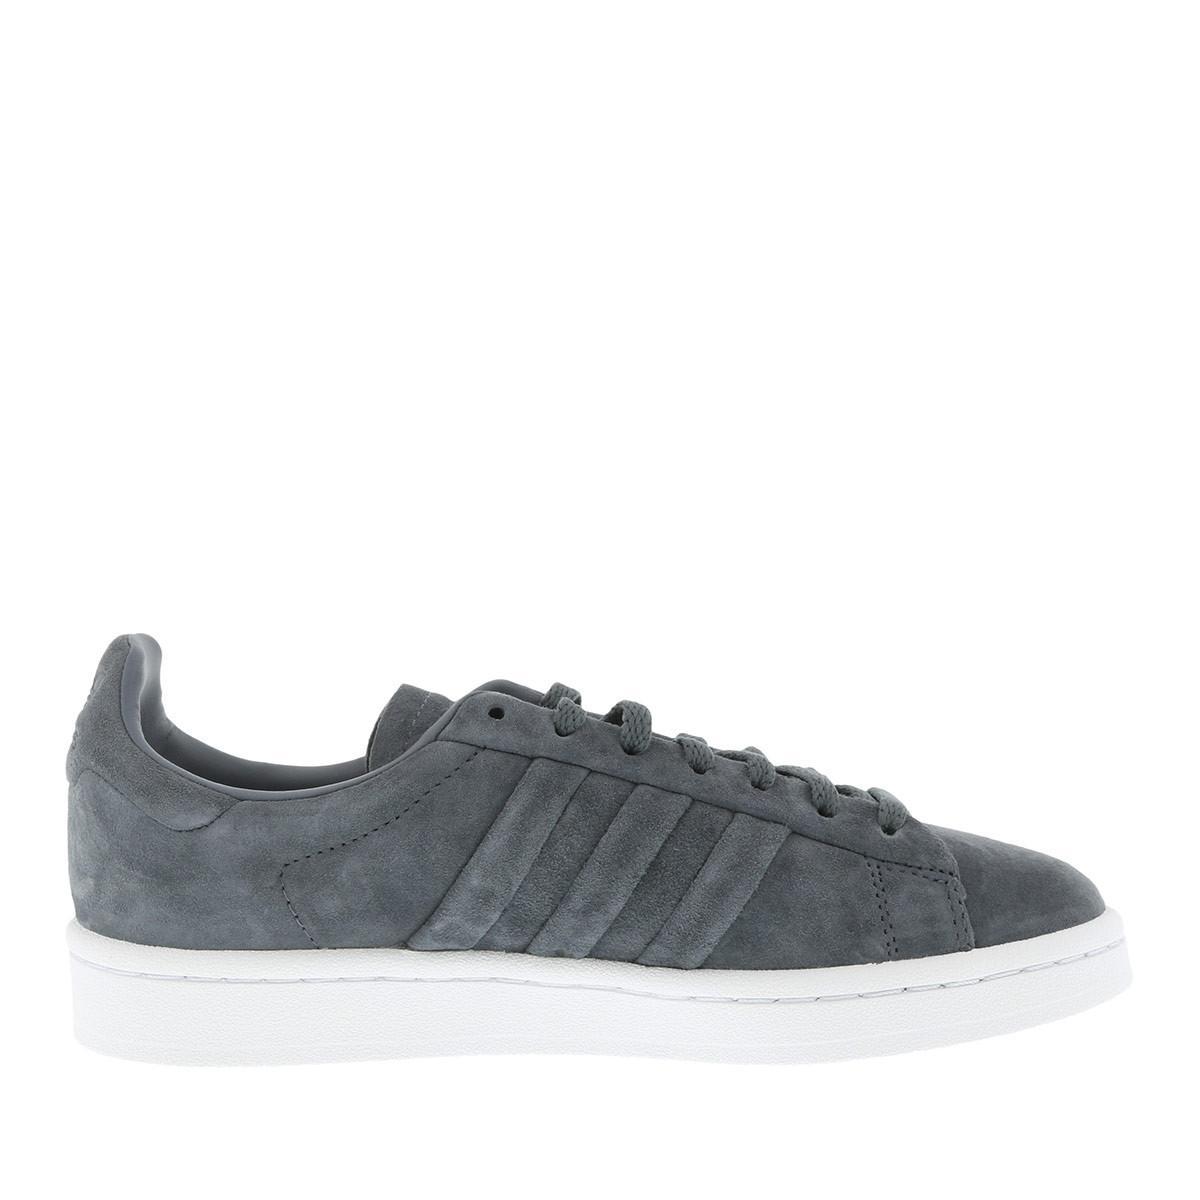 Adidas Originals Campus Stitch y giro W Onix / Onix / goldmt para hombres